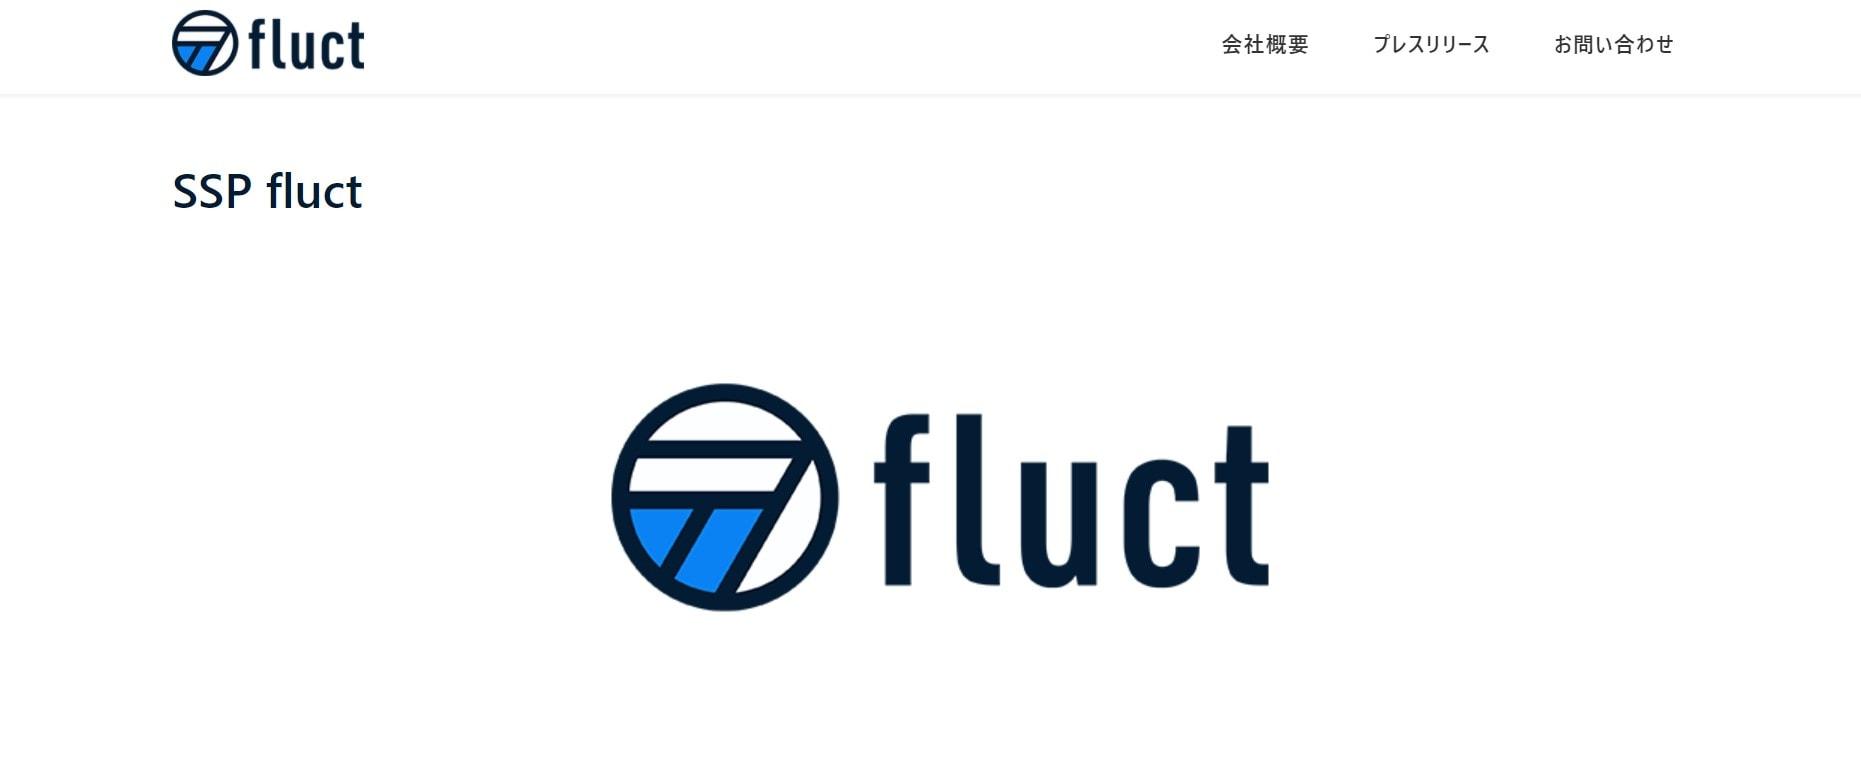 Fluct(フラクト)